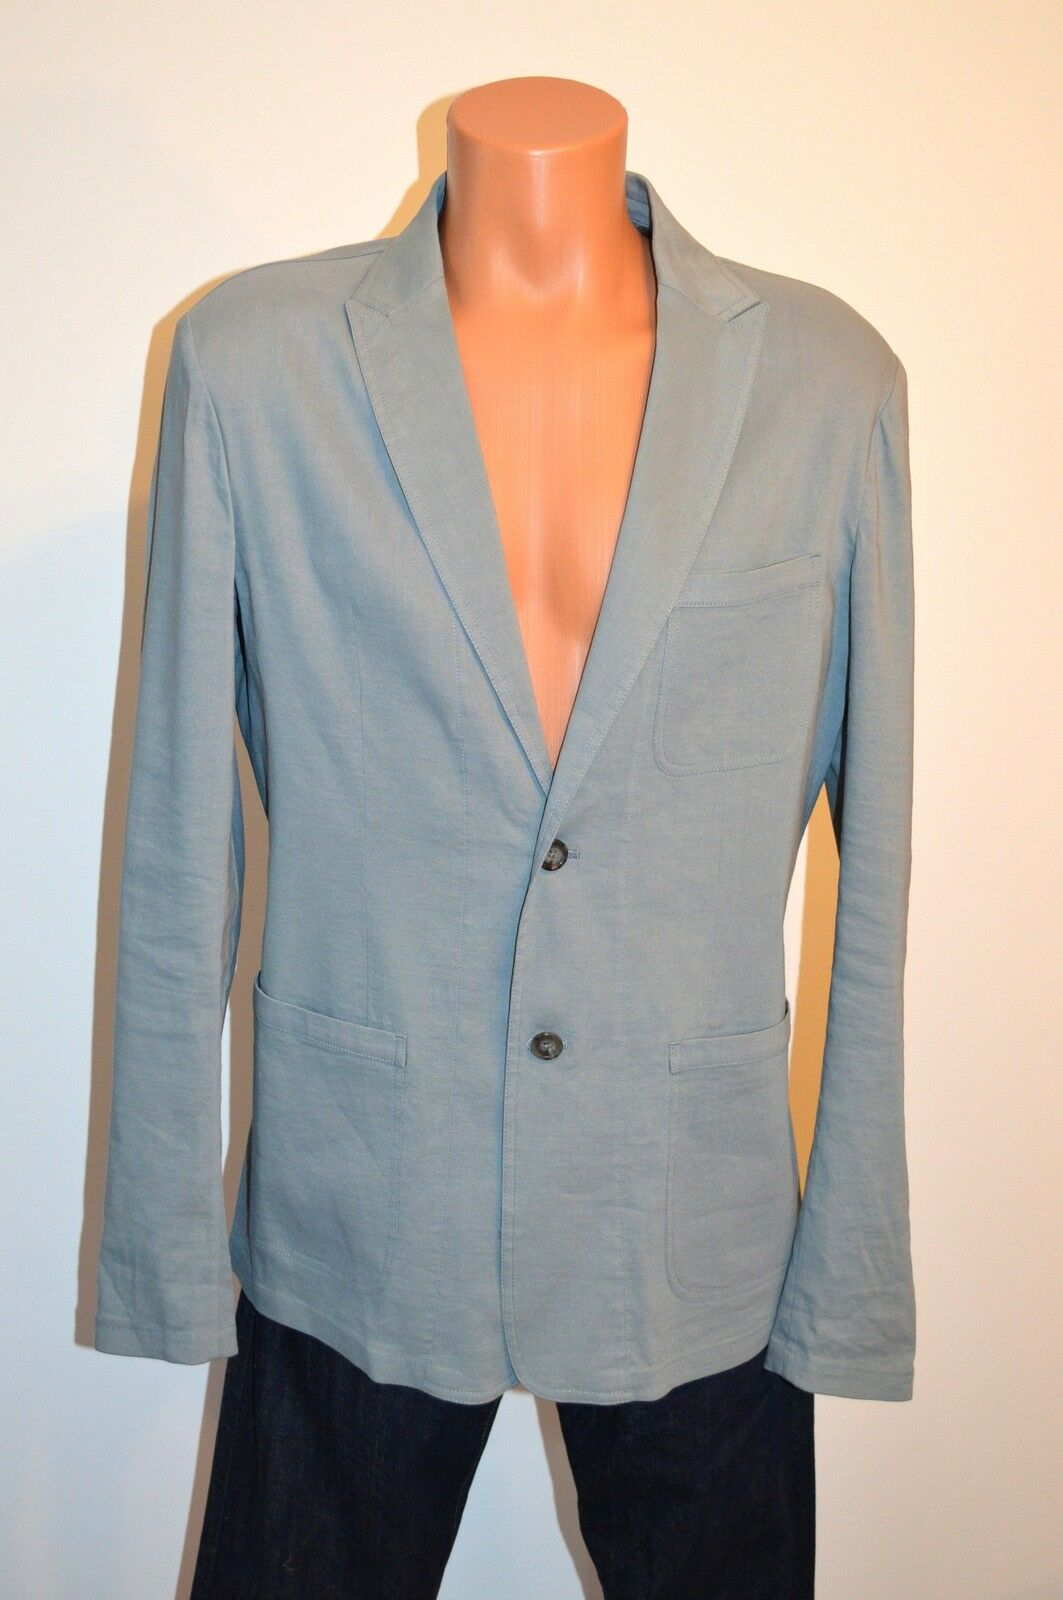 New 398 Elie Tahari Miles Linen Sports Coat Blazer Rainstorm Blau sz Large